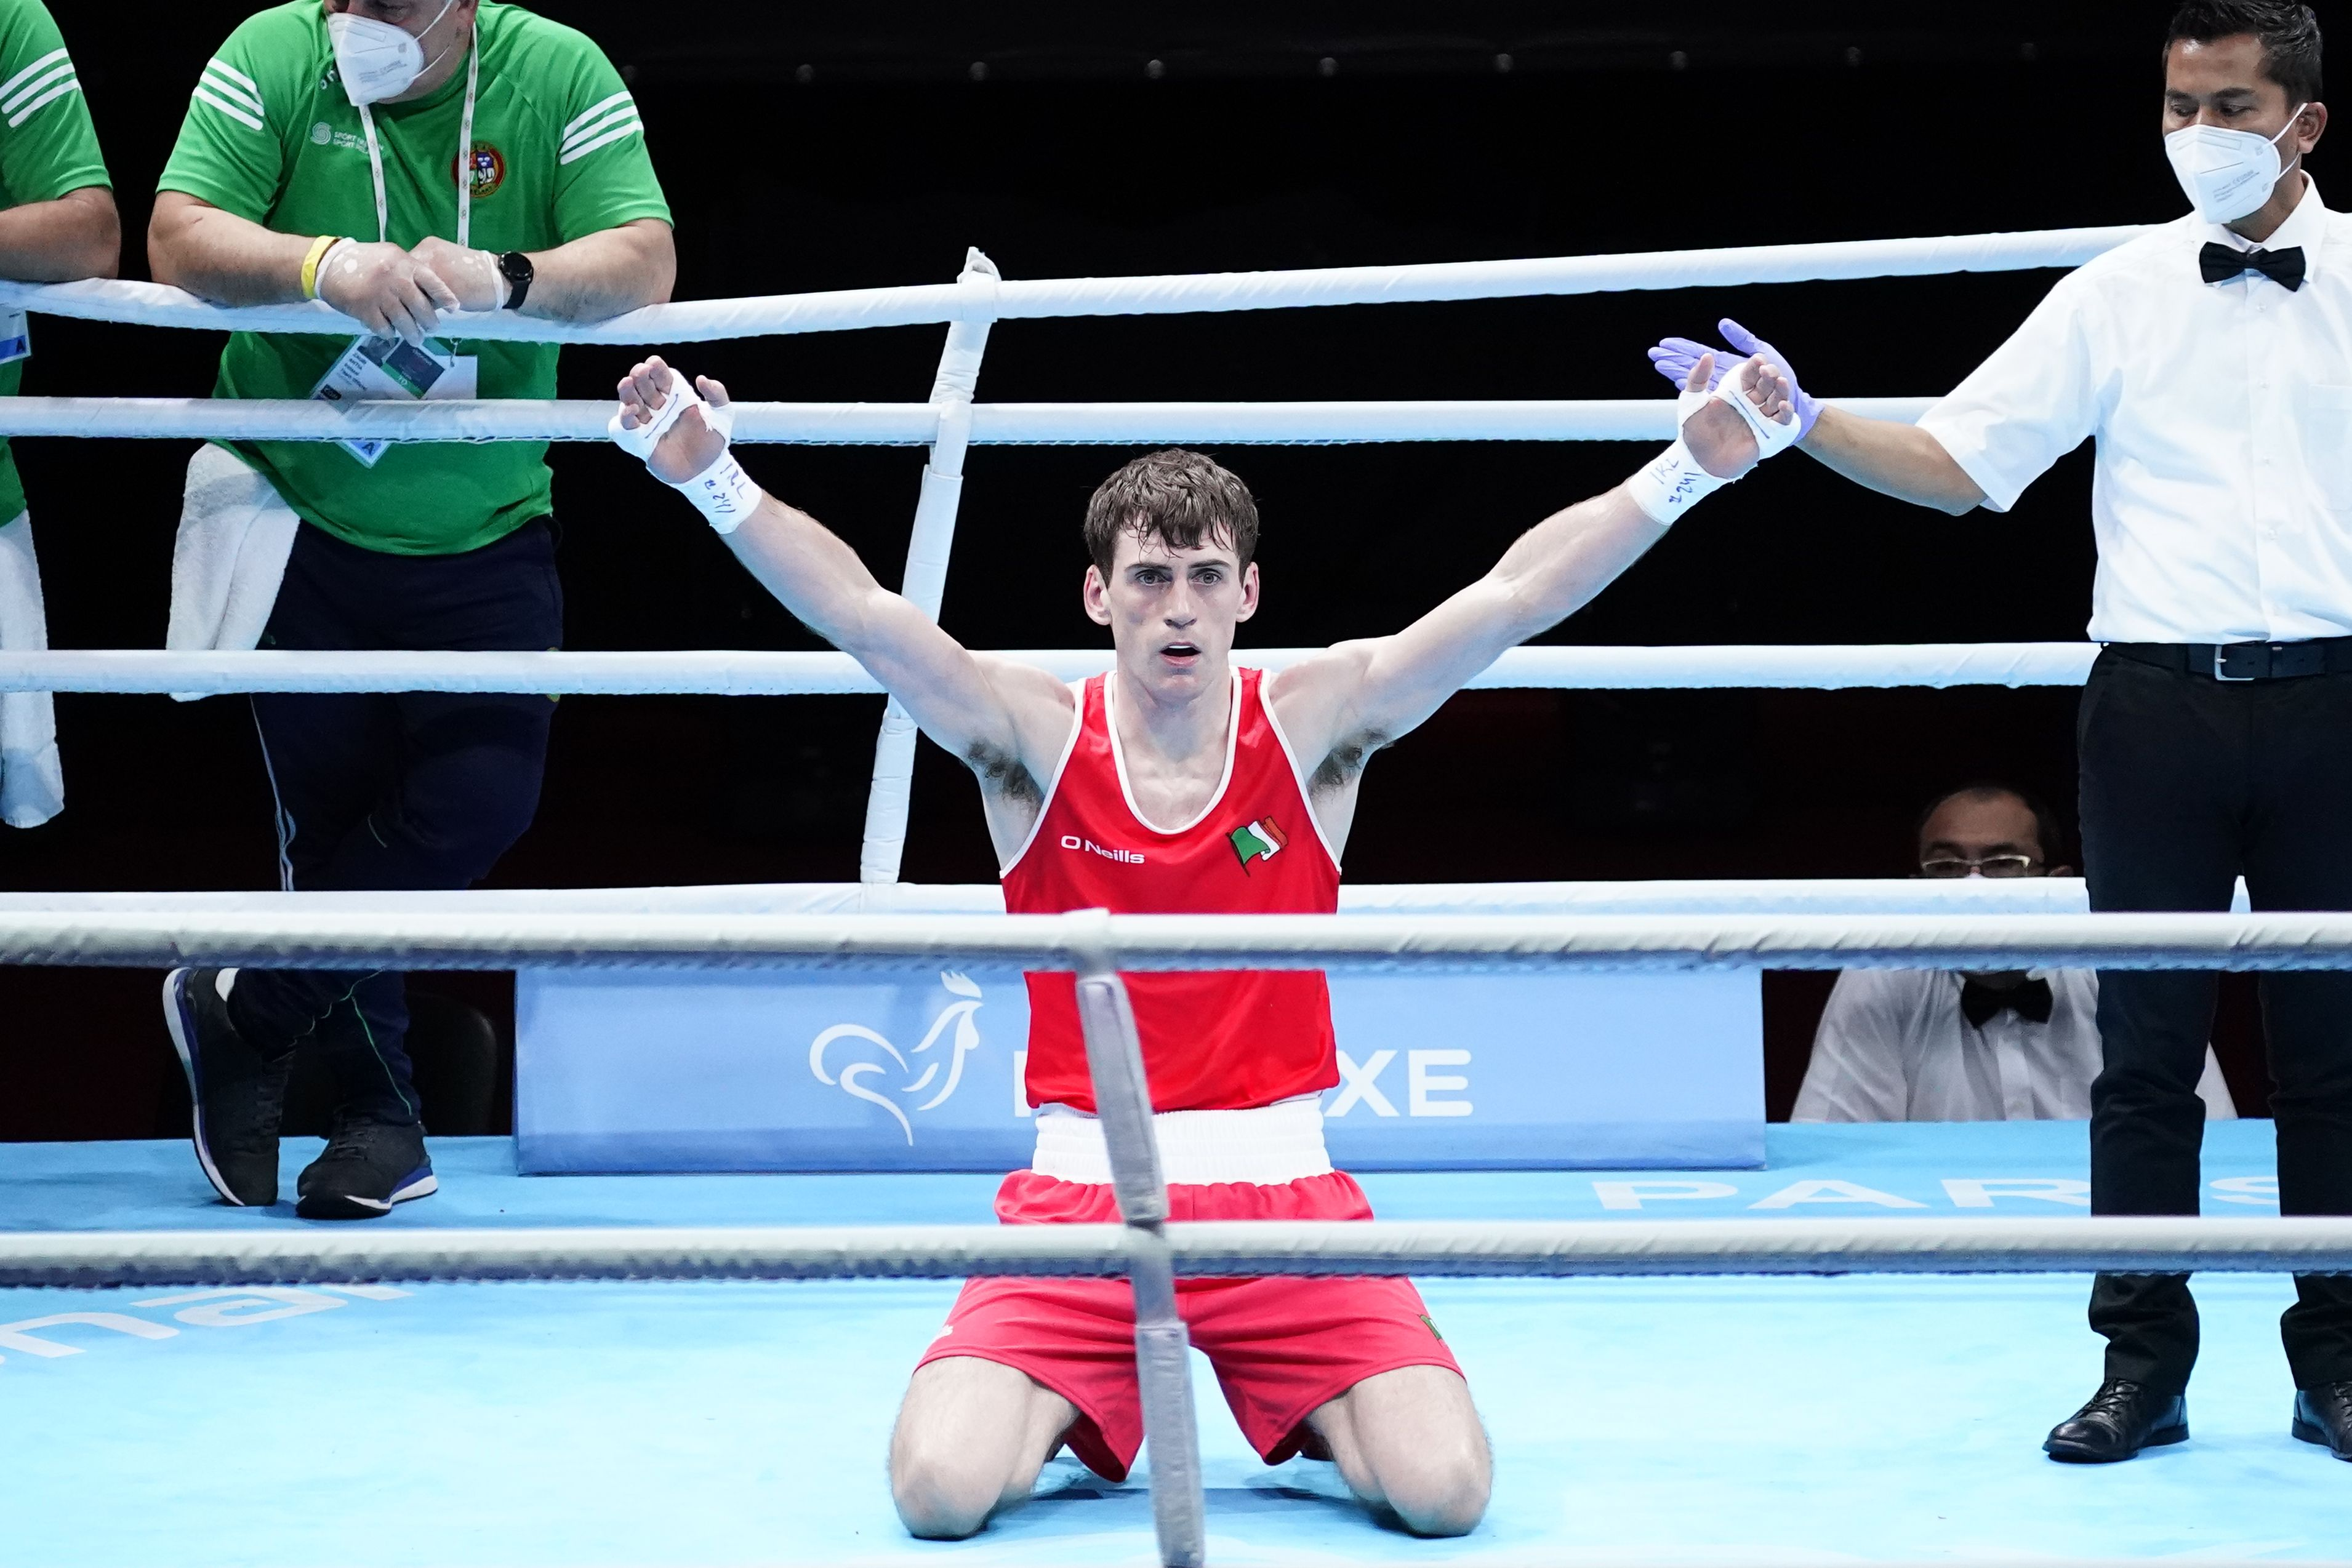 Aidan Walsh drops to his knees after victory over Yevheni Barabandy